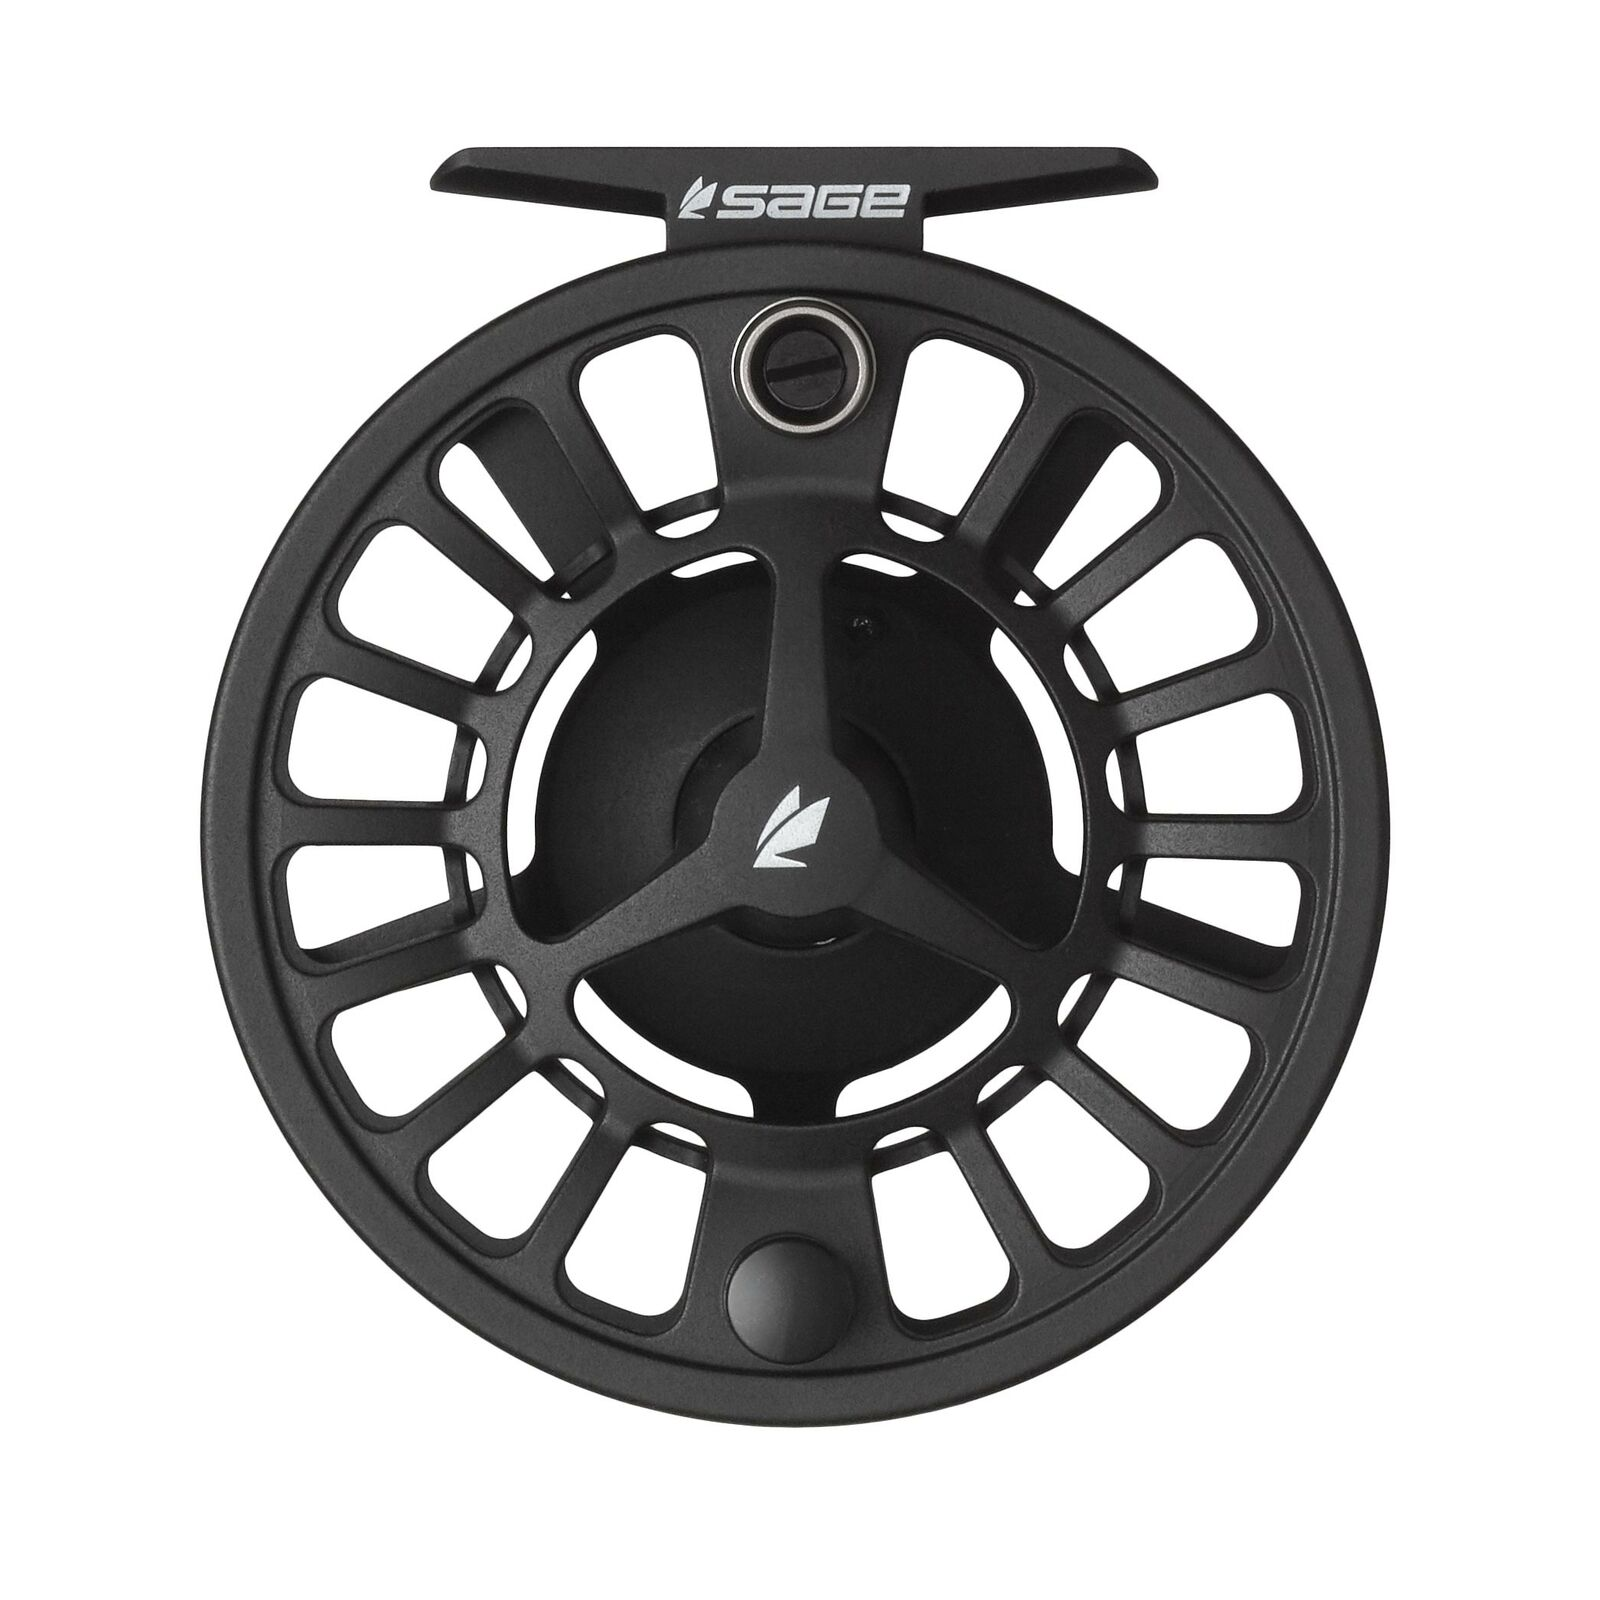 Sage Espectro Serie C Grande Arbor Fly Fishing Reel